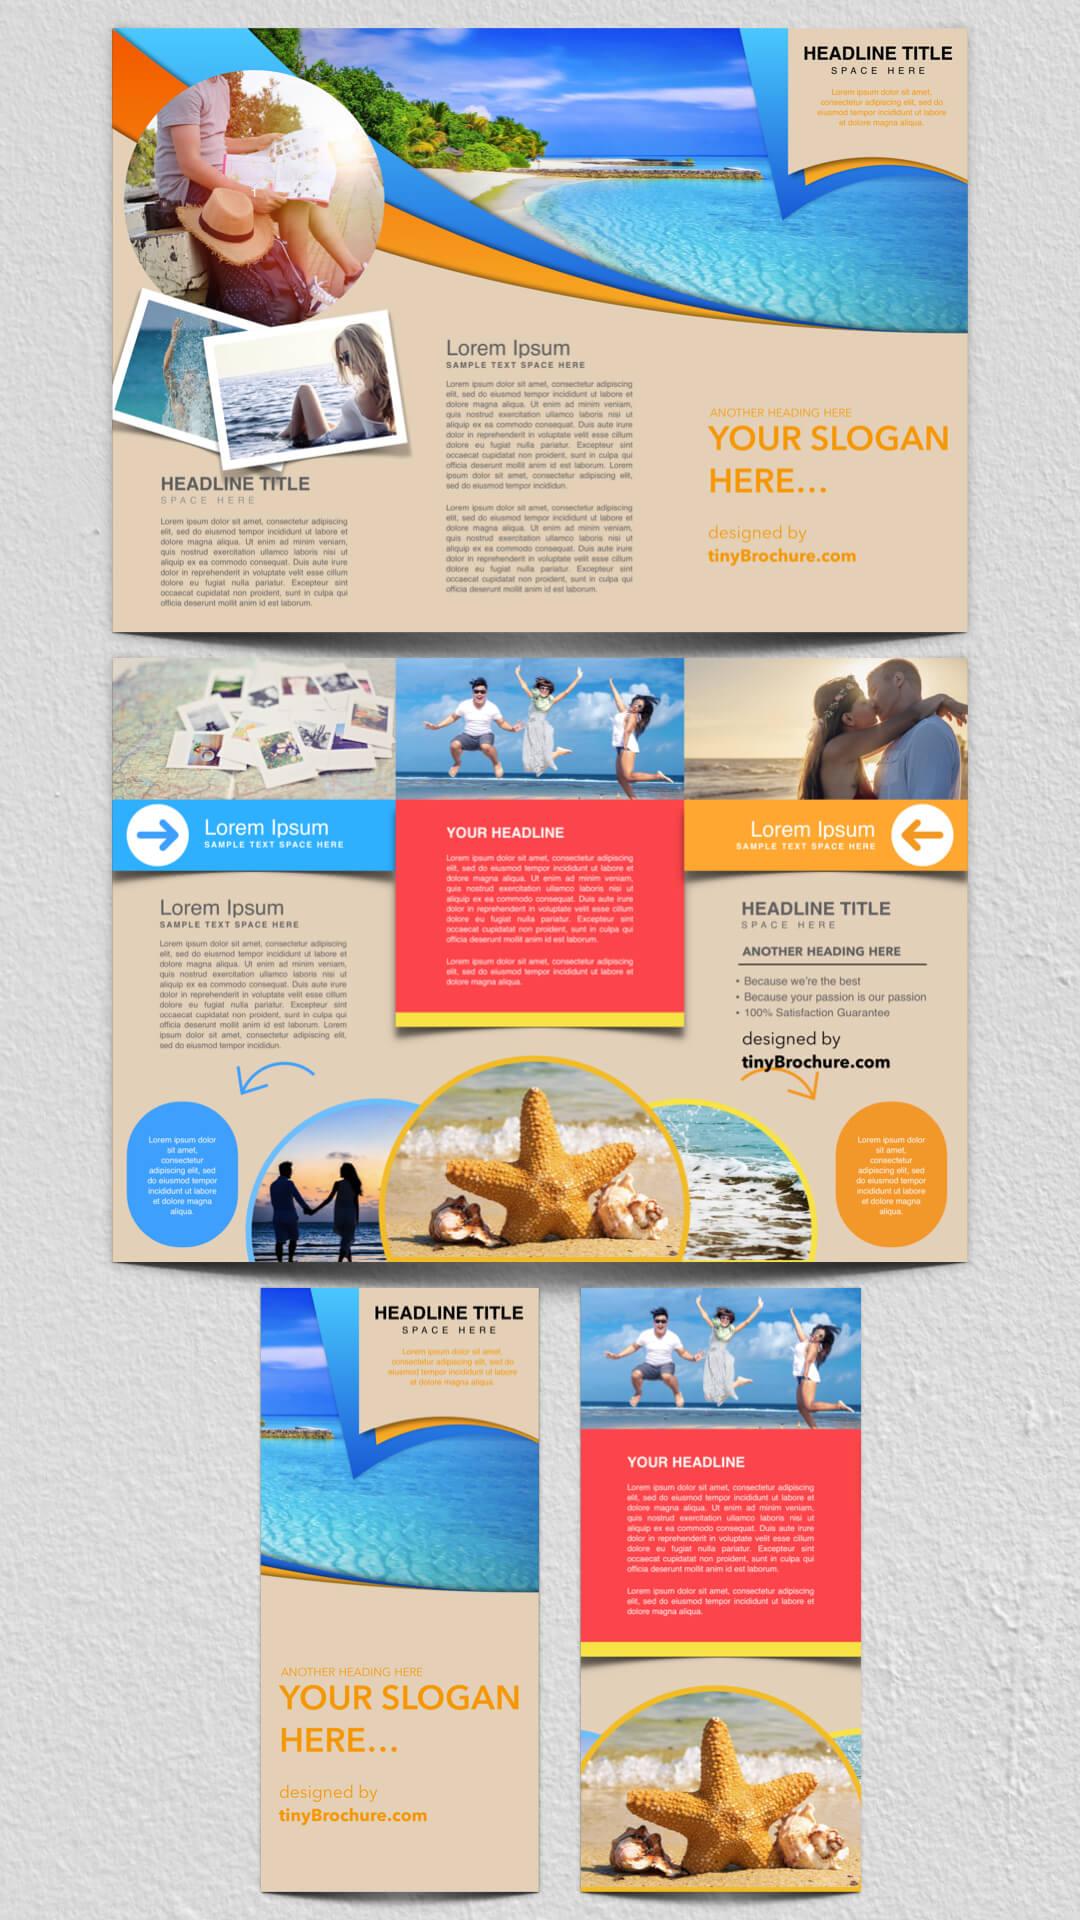 Travel Brochure Template Google Docs   Travel Brochure Intended For Google Docs Travel Brochure Template